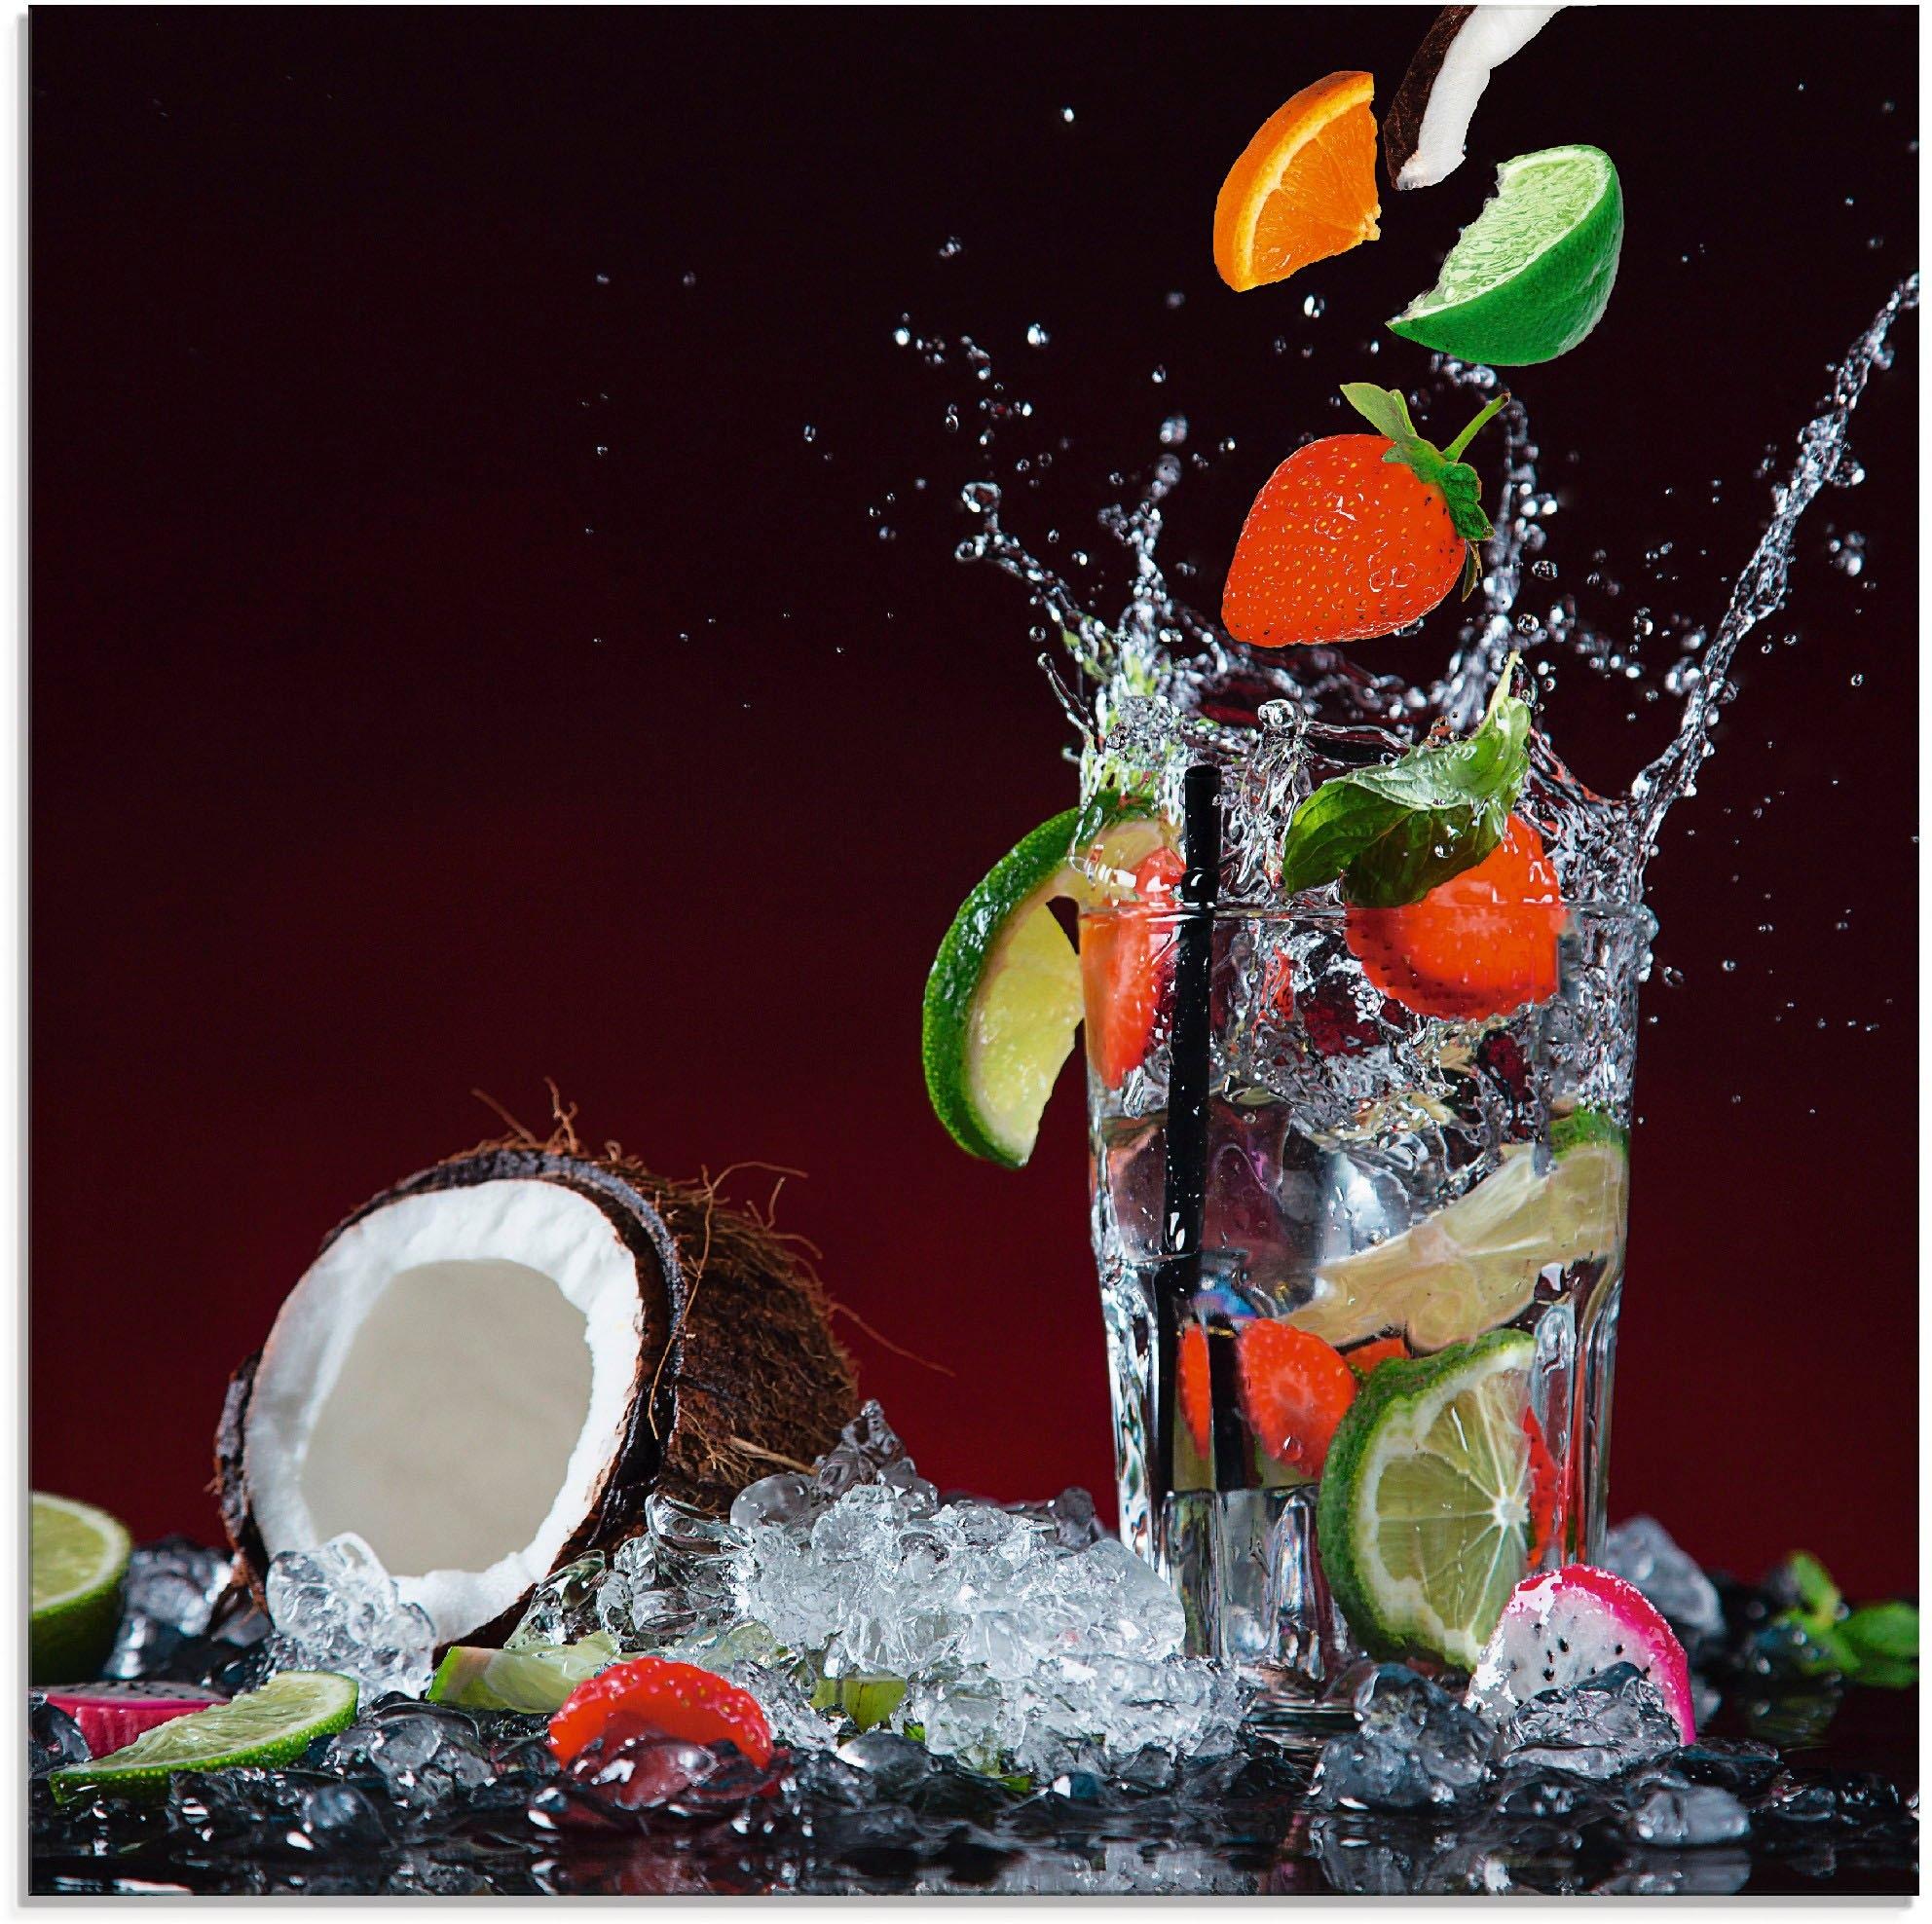 Artland print op glas Verse fruitcocktail V (1 stuk) goedkoop op otto.nl kopen